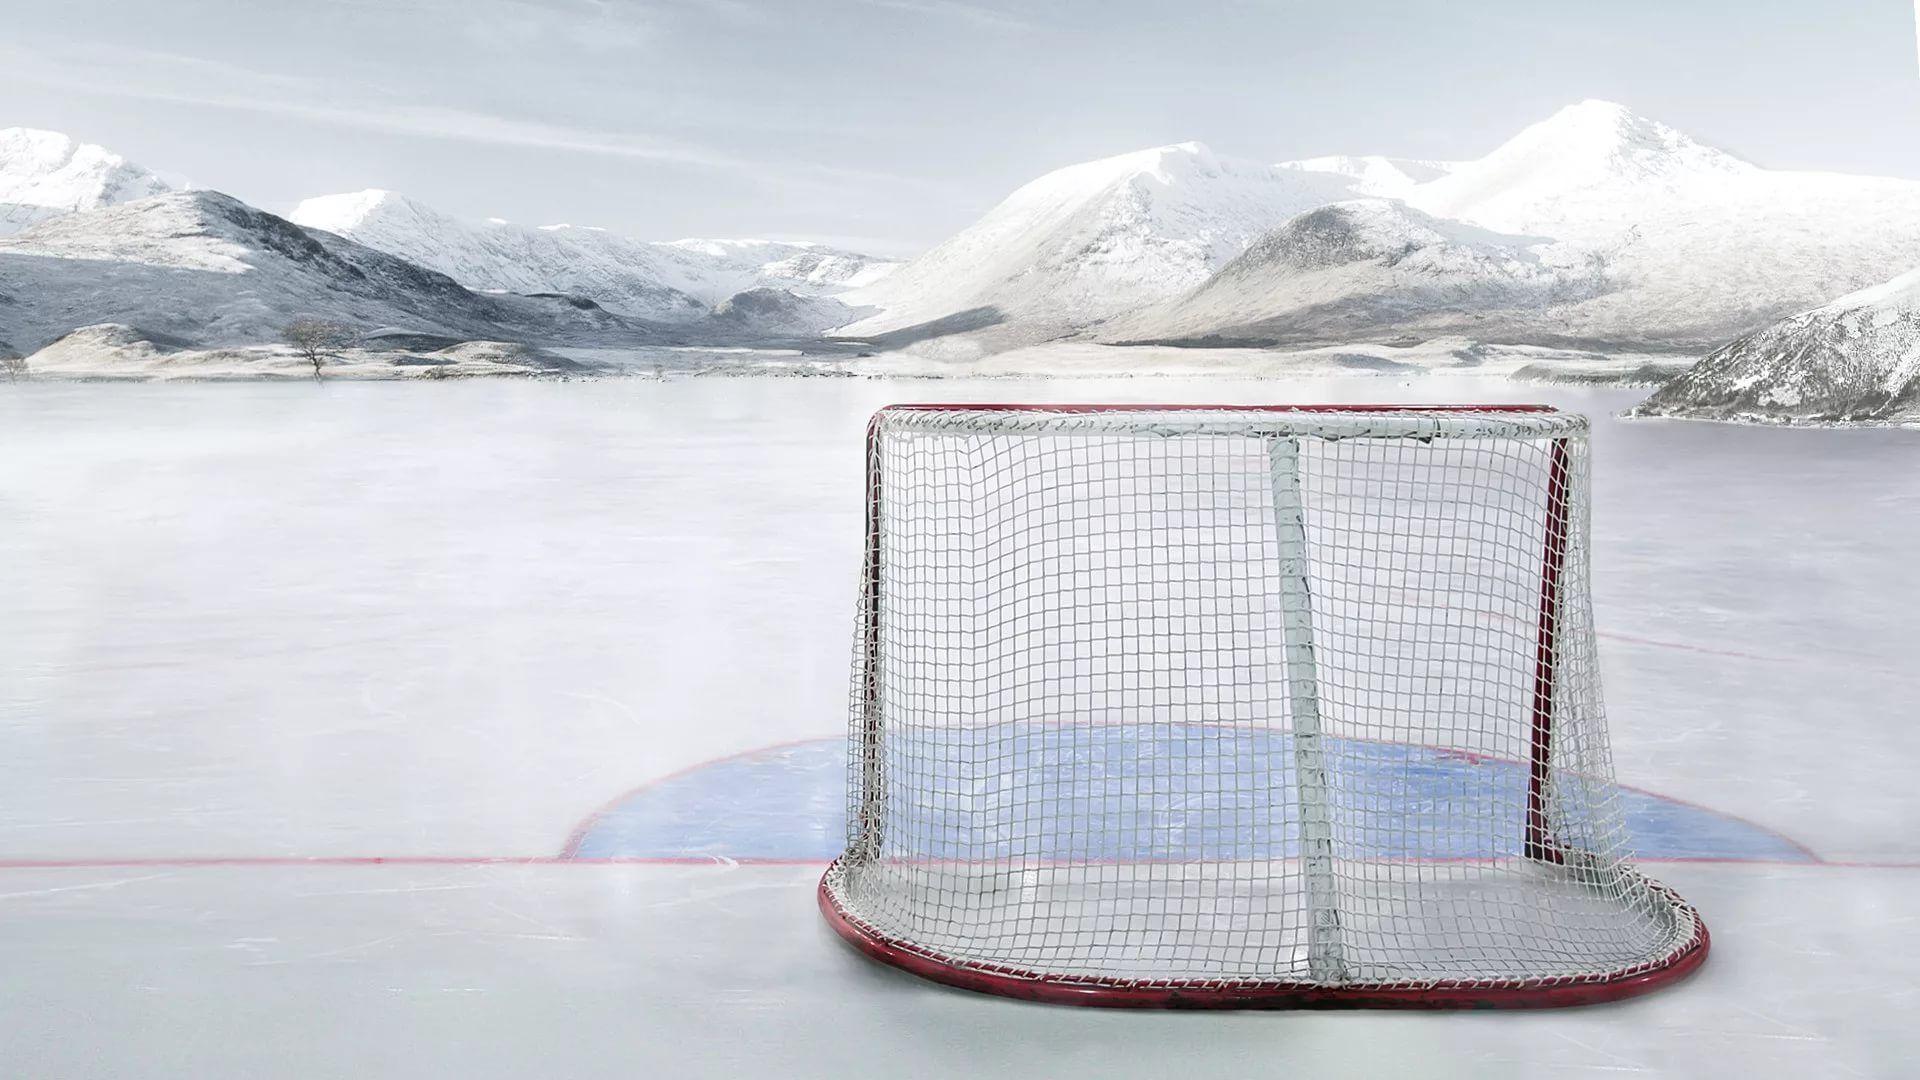 Ice Hockey best Wallpaper